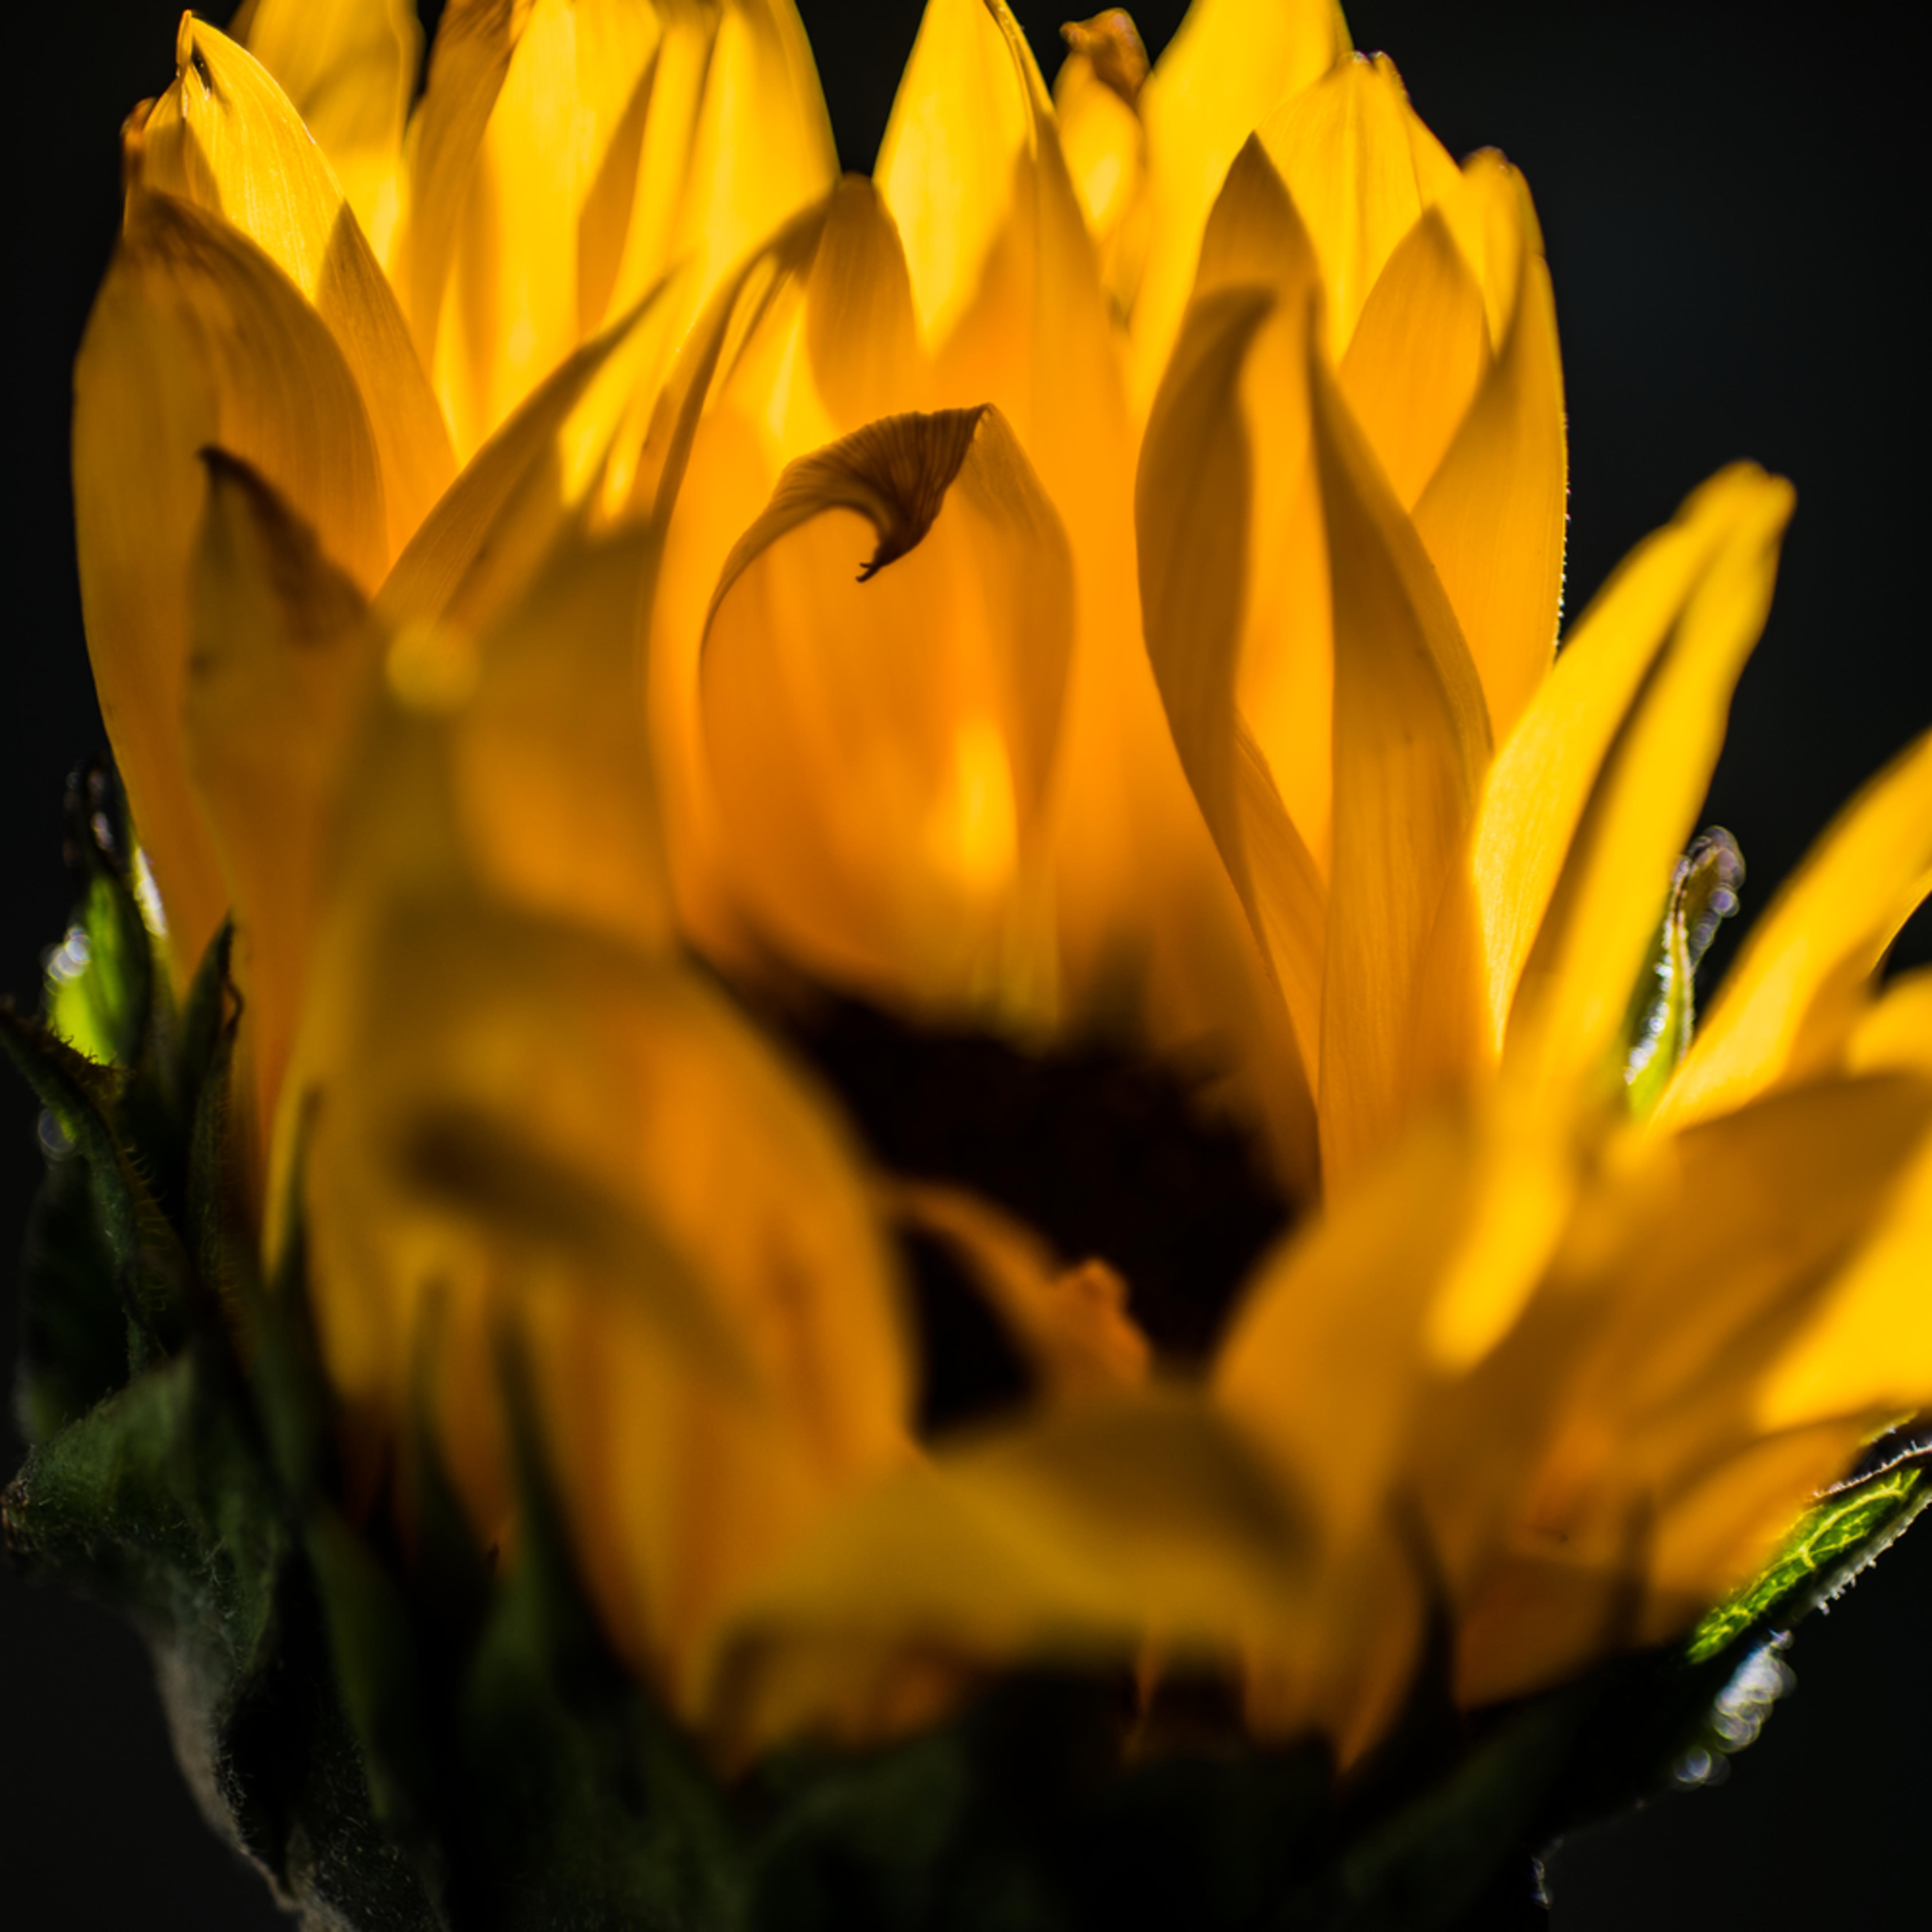 2017 february flowers14 gapuu1